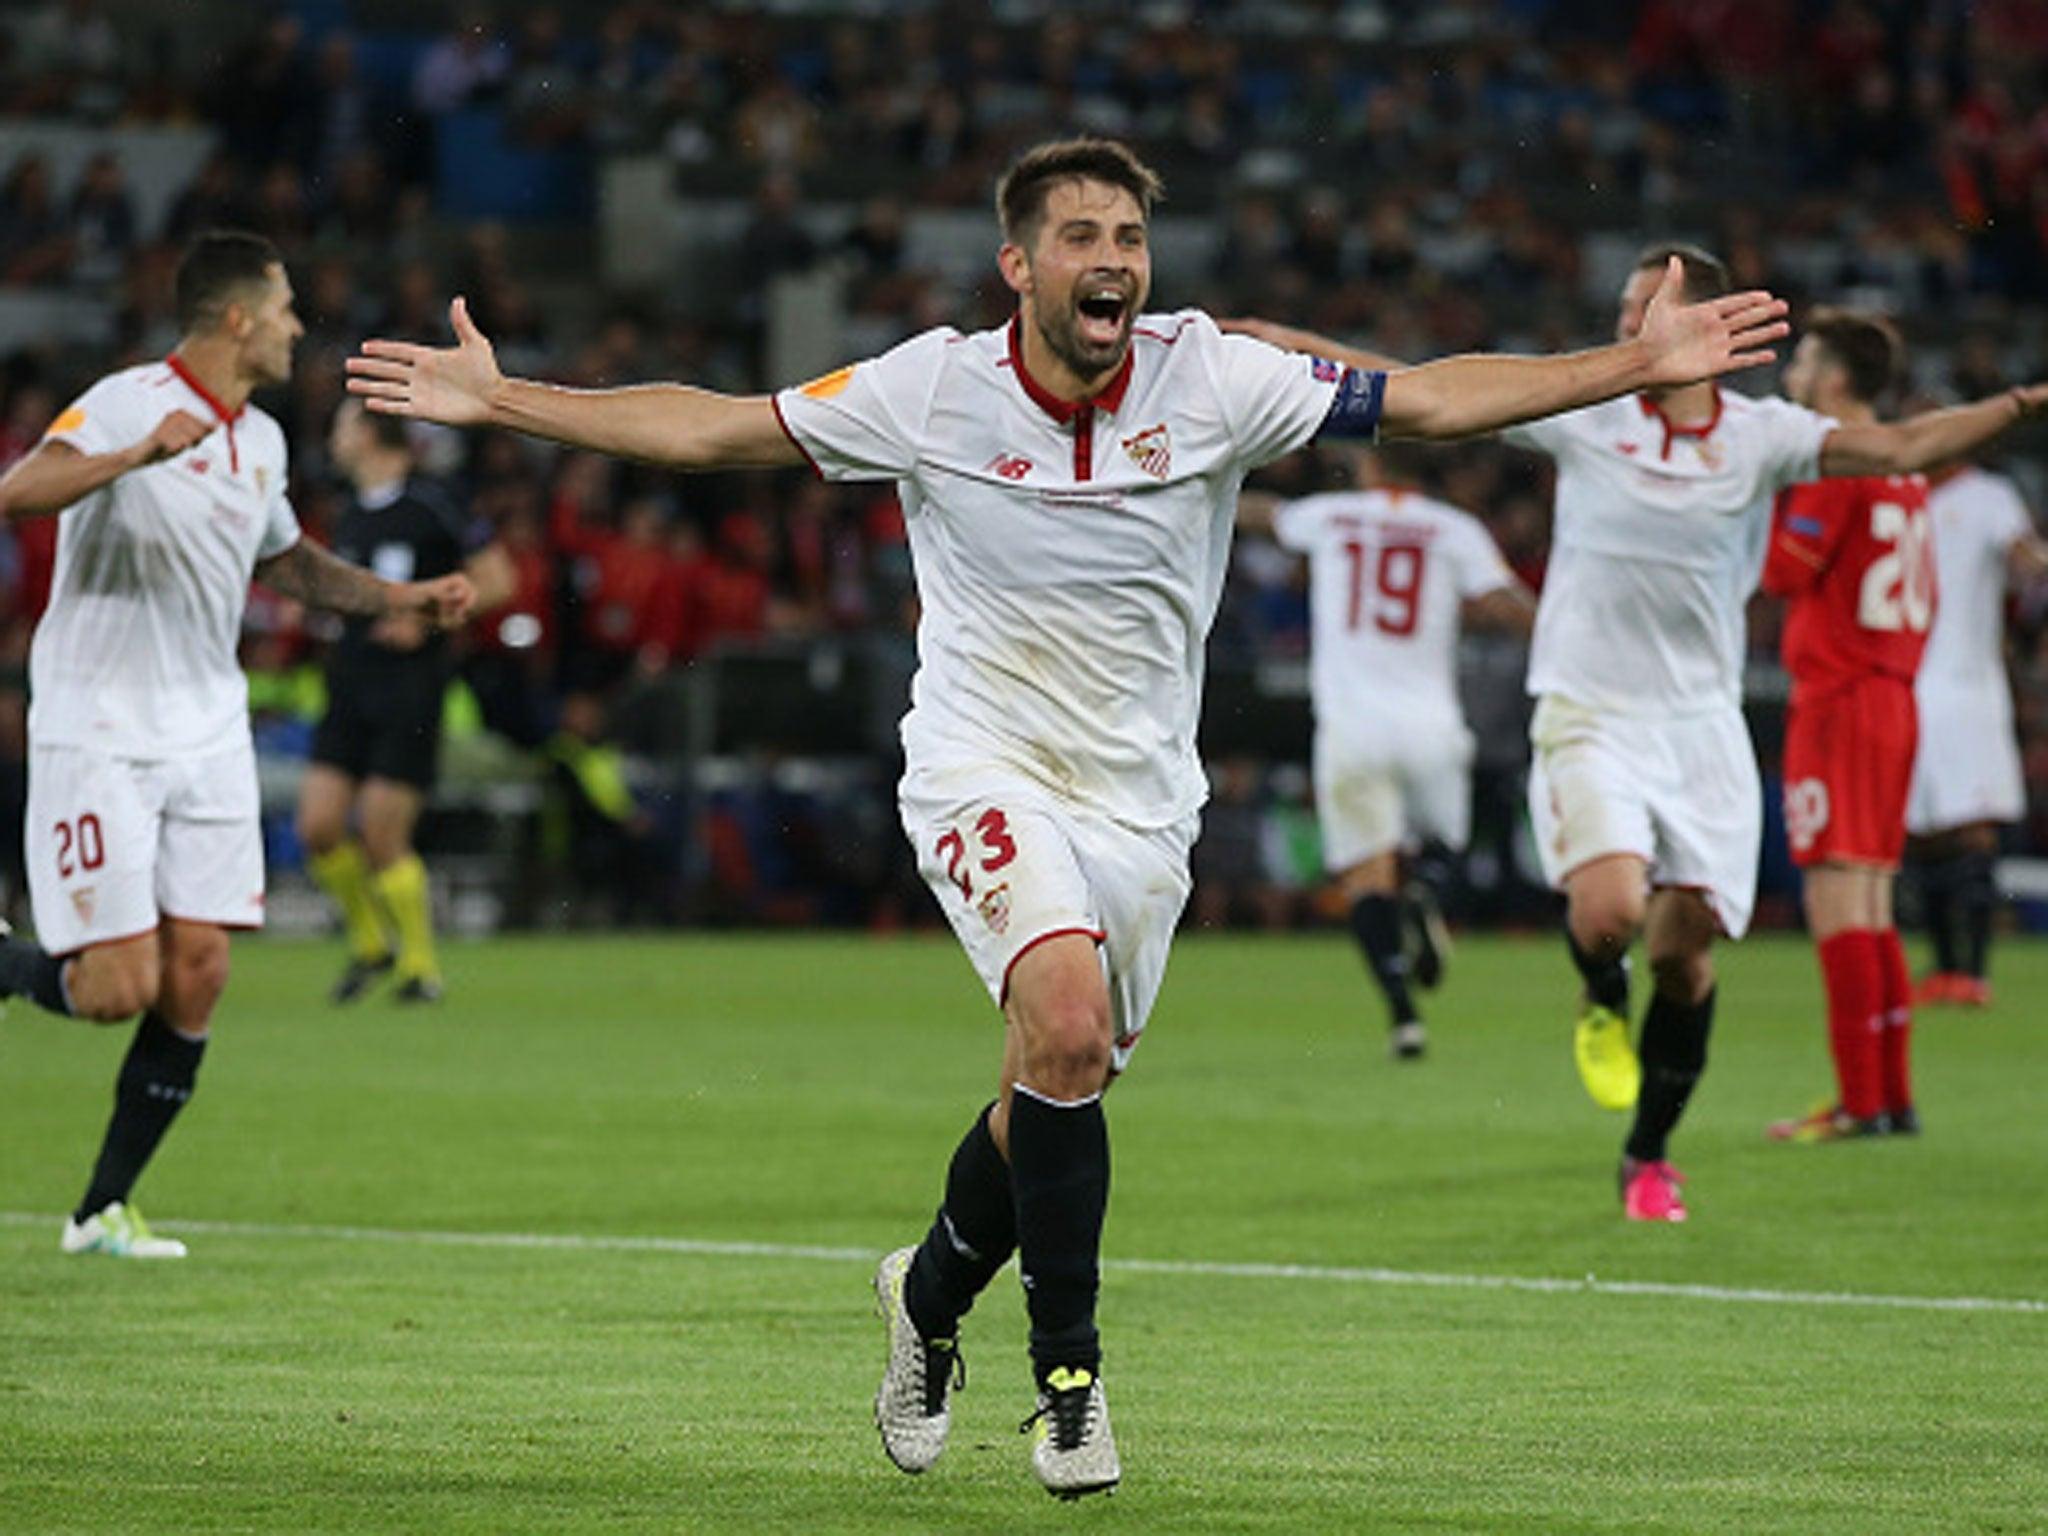 Liverpool Sevilla Free Tv